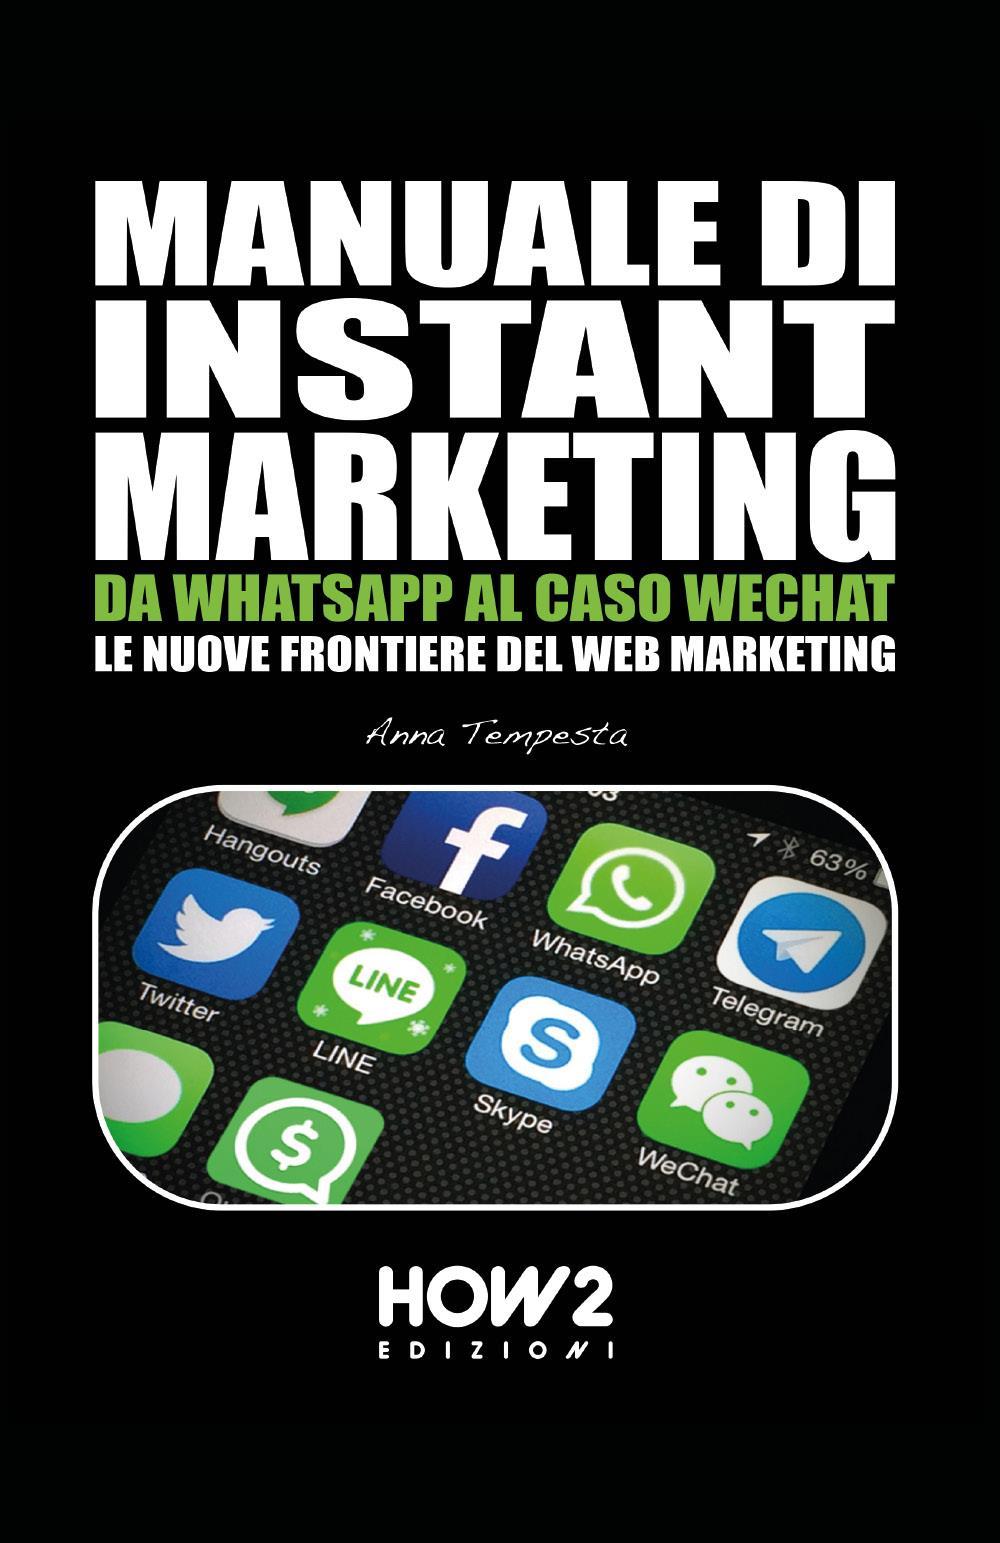 Manuale di instant marketing